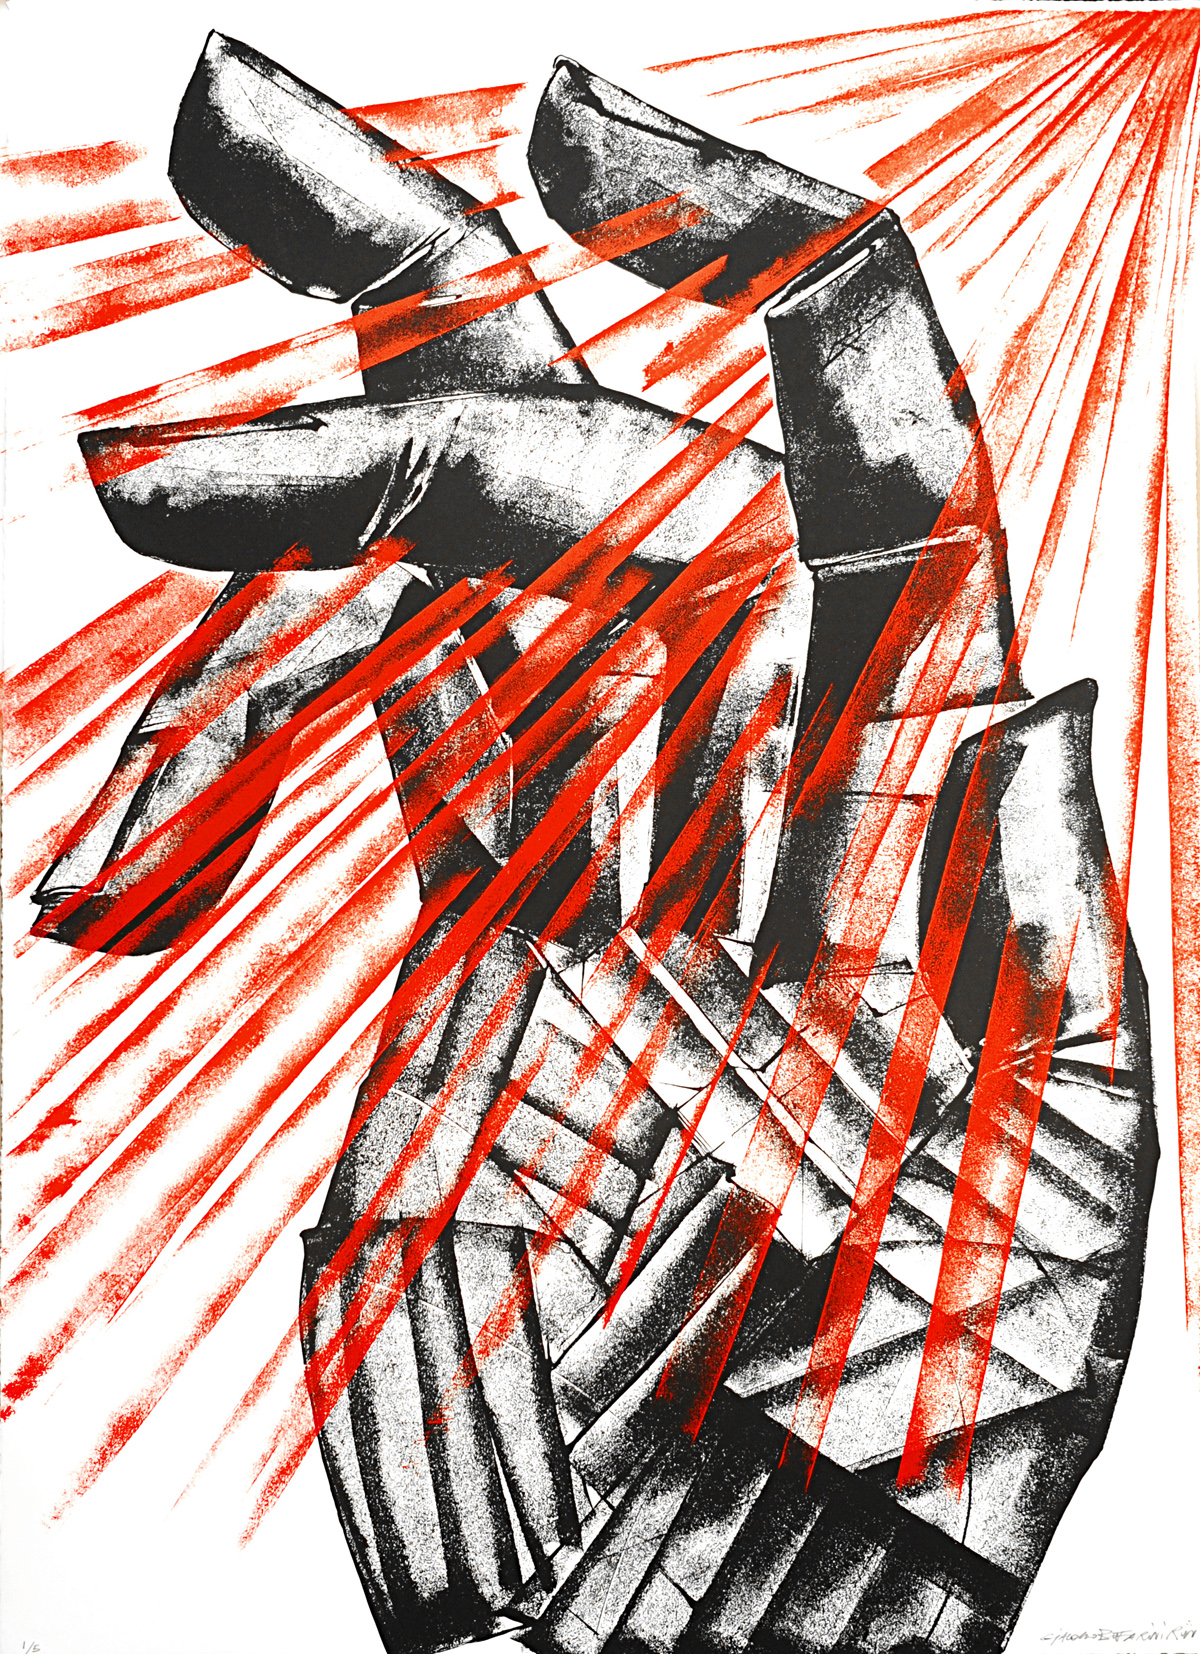 "<a href=""https://howardgriffinprints.com/artists/giacomo-bufarini-run/"">Giacomo Bufarini</a> / <a href=""https://howardgriffinprints.com/print/giacomo-bufarini-run/light-in-dark//""><em>A Light In The Dark (Hope) </em></a>"